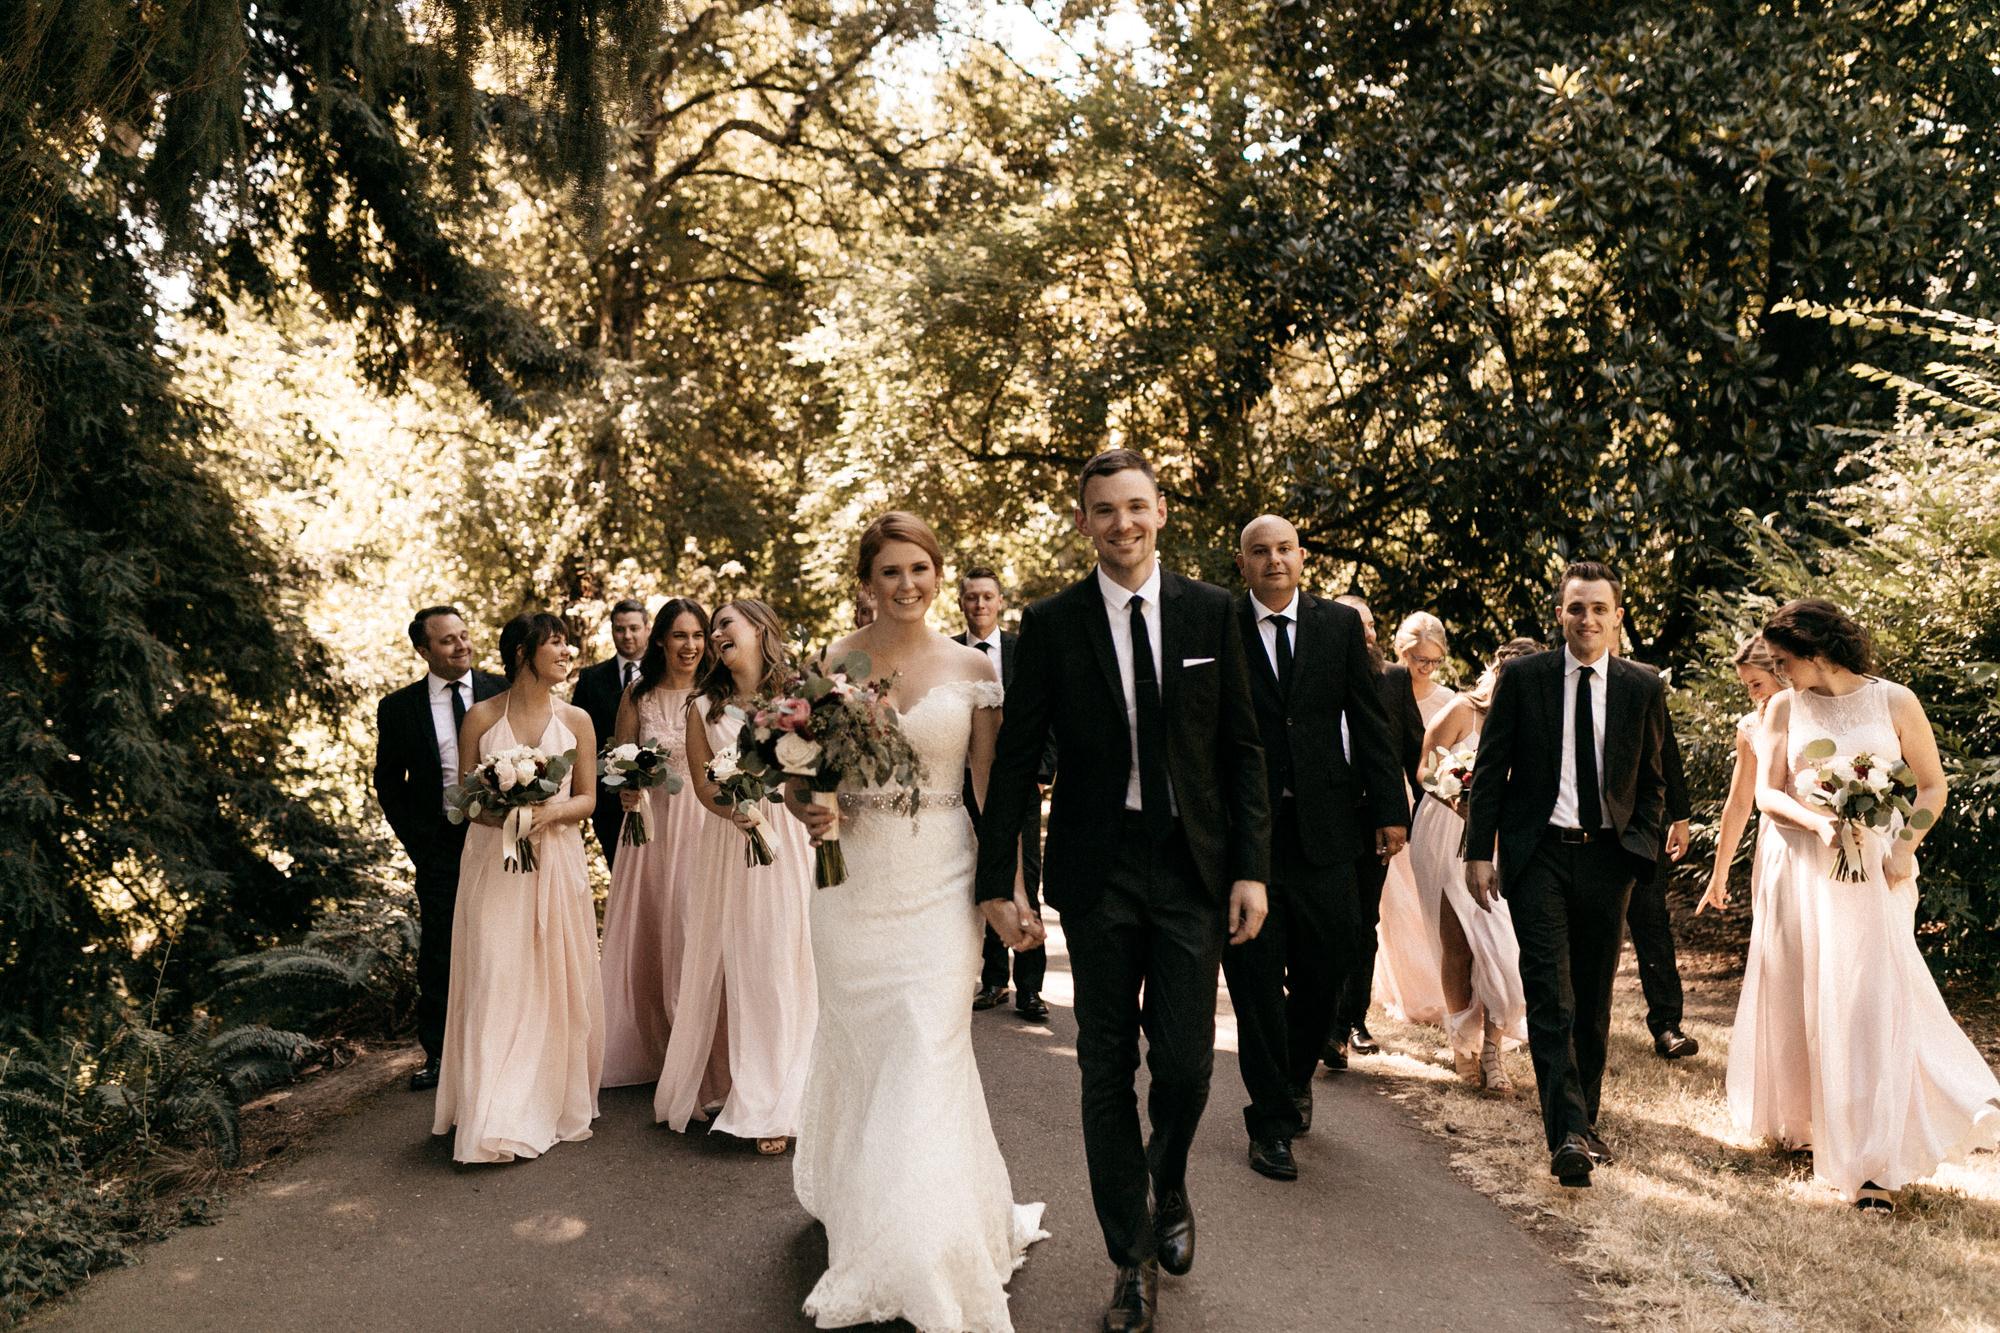 the_evergreen_portland_wedding-35.jpg